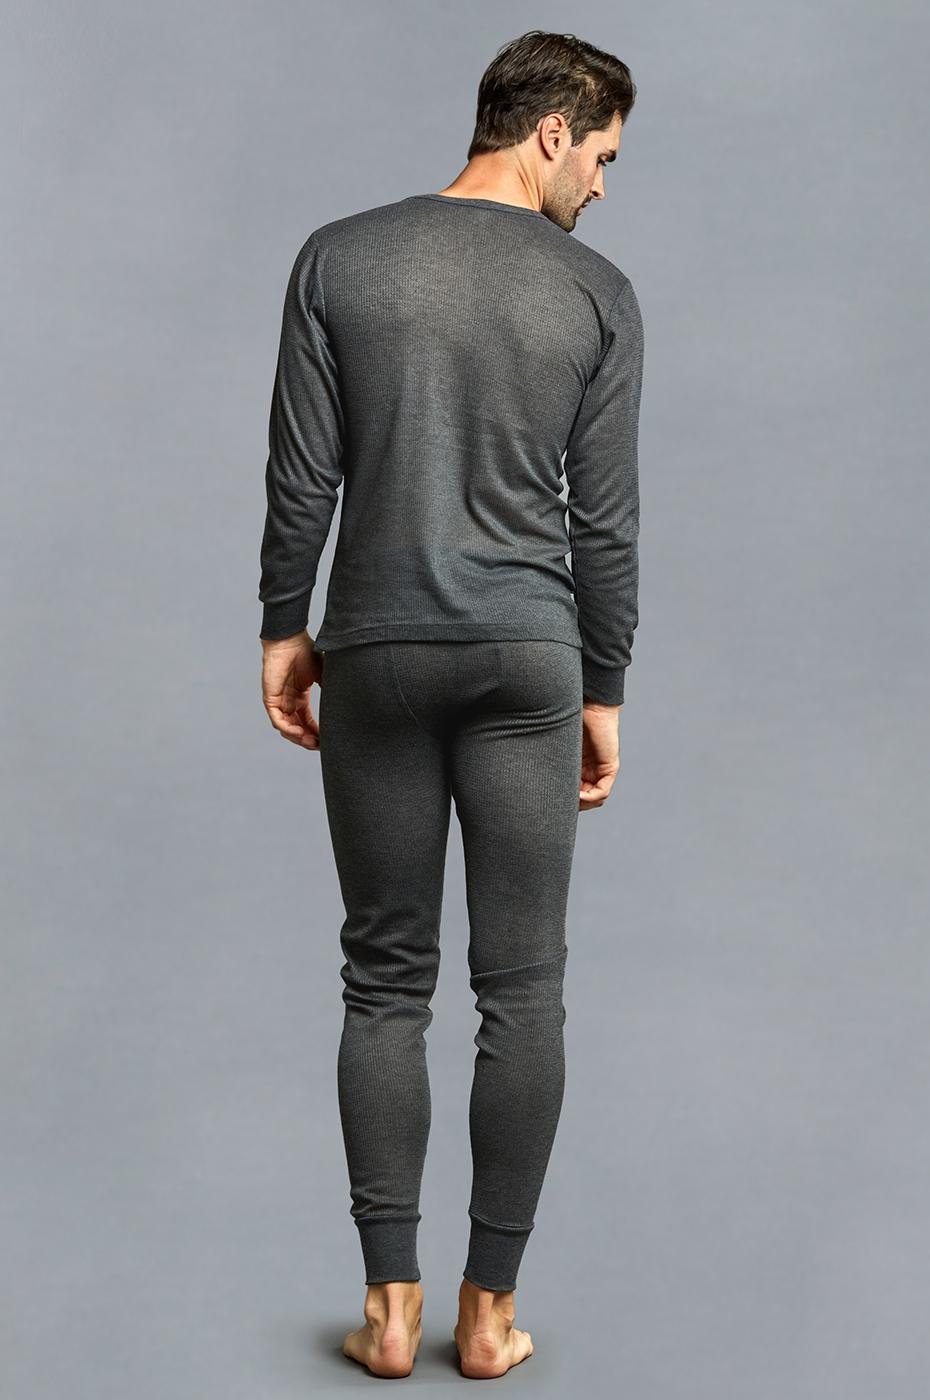 Men-039-s-Thermal-Long-Underwear-Top-Bottom-Medium-Weight-Waffle-Knit-Warm-Layering miniatuur 5